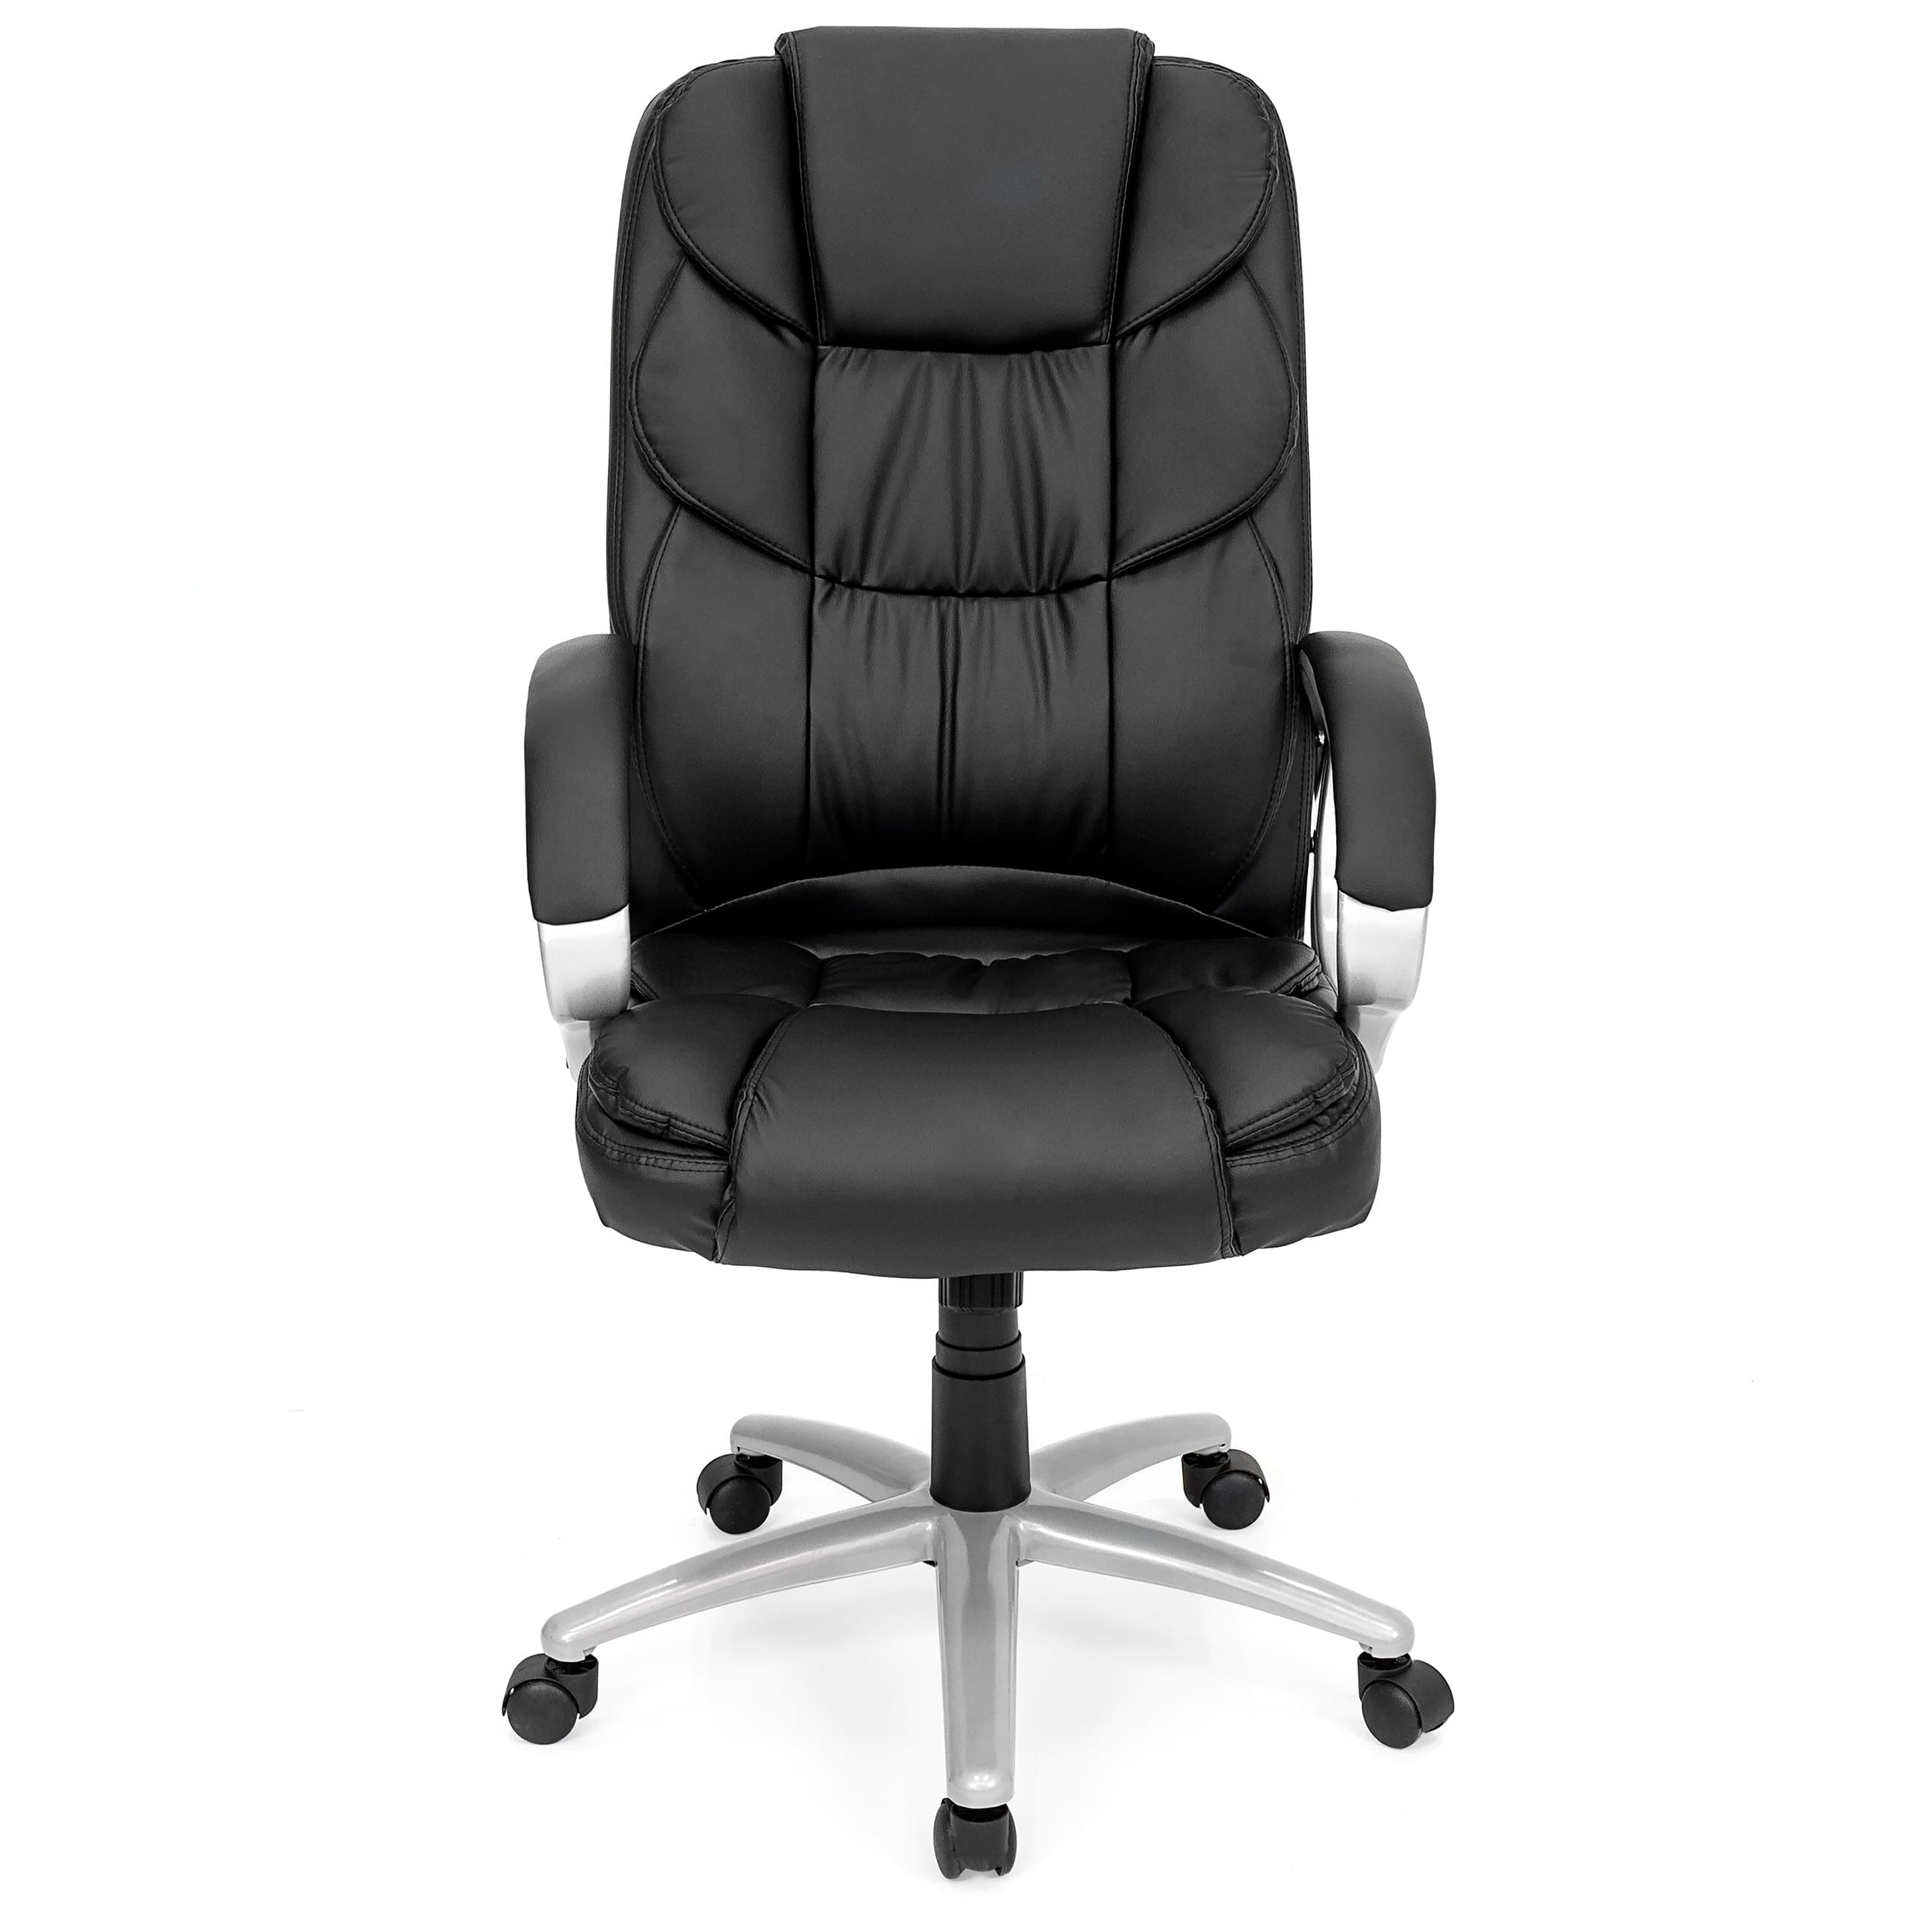 BCP Ergonomic PU Leather High Back Executive Office Chair (Black) $55.99